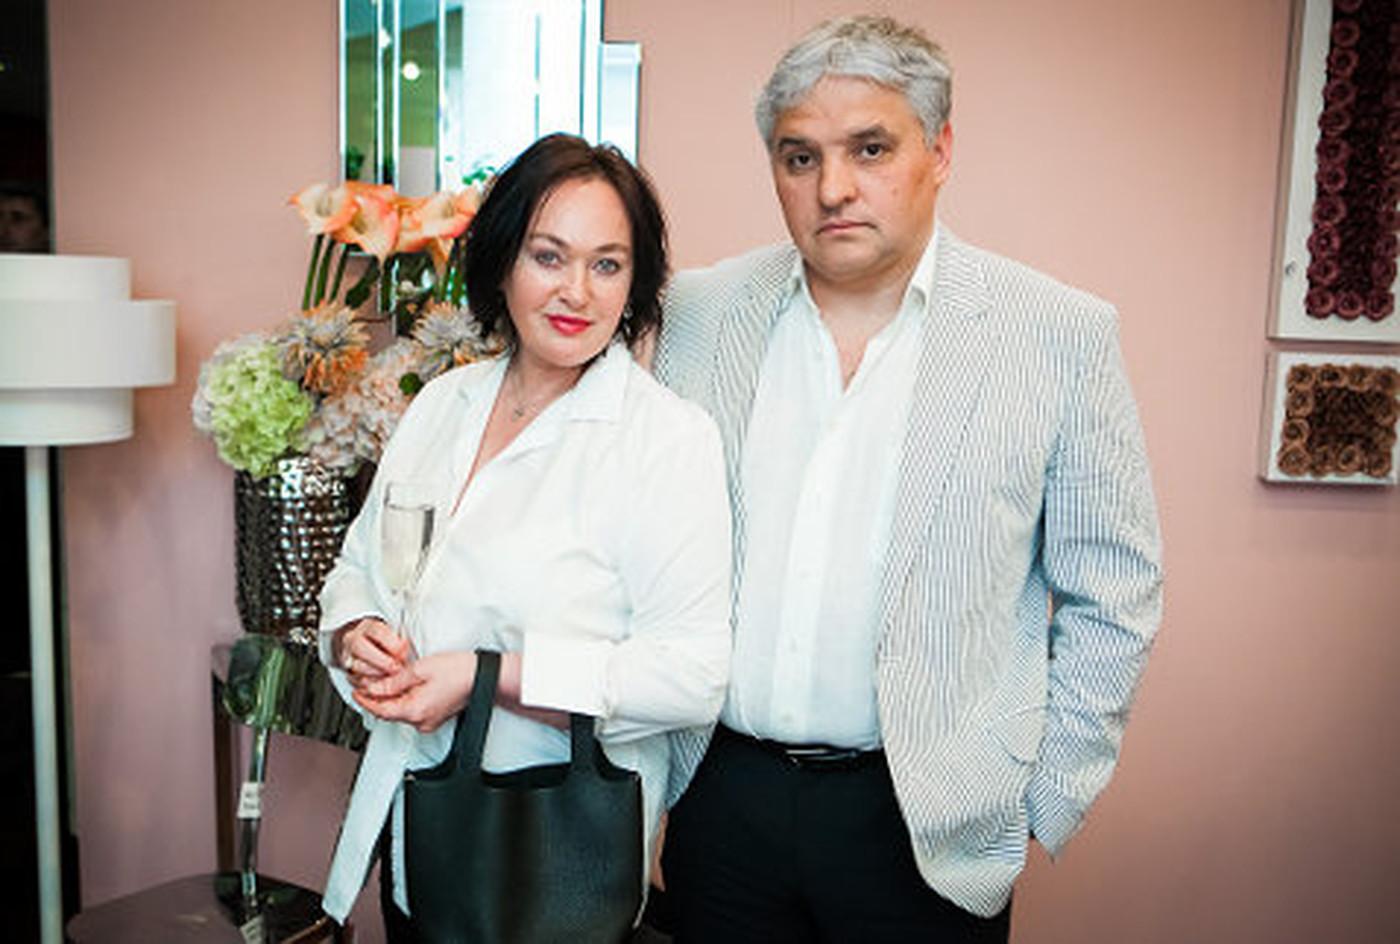 Лариса Гузеева объяснила, почему не живет с мужем спустя 18 лет брака